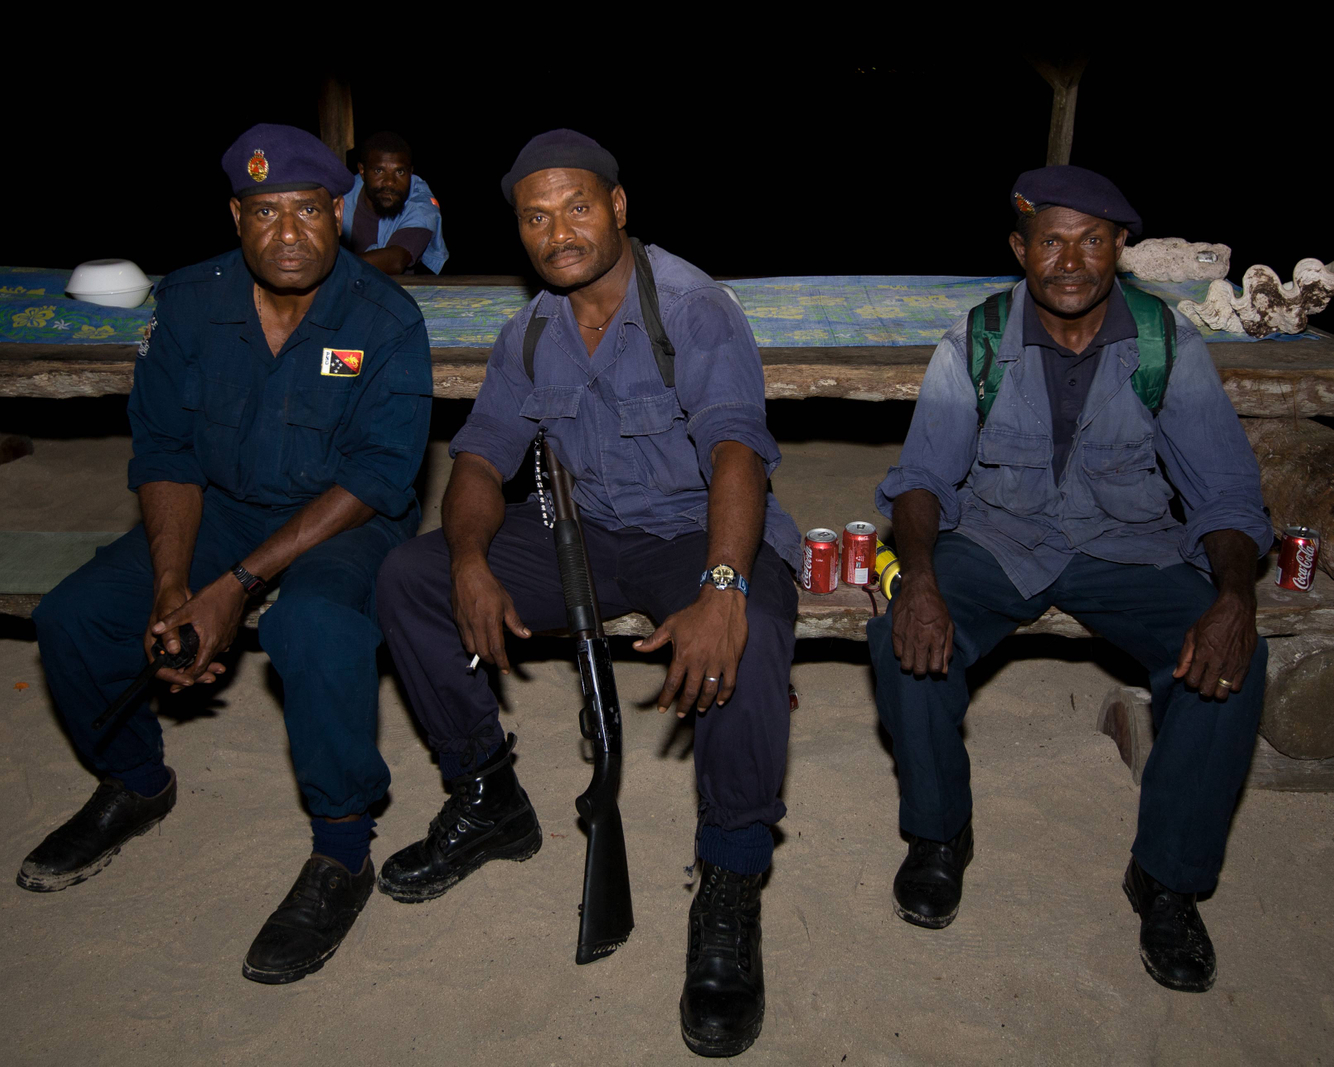 Kavieng_Surf_Camp_Guards.jpg